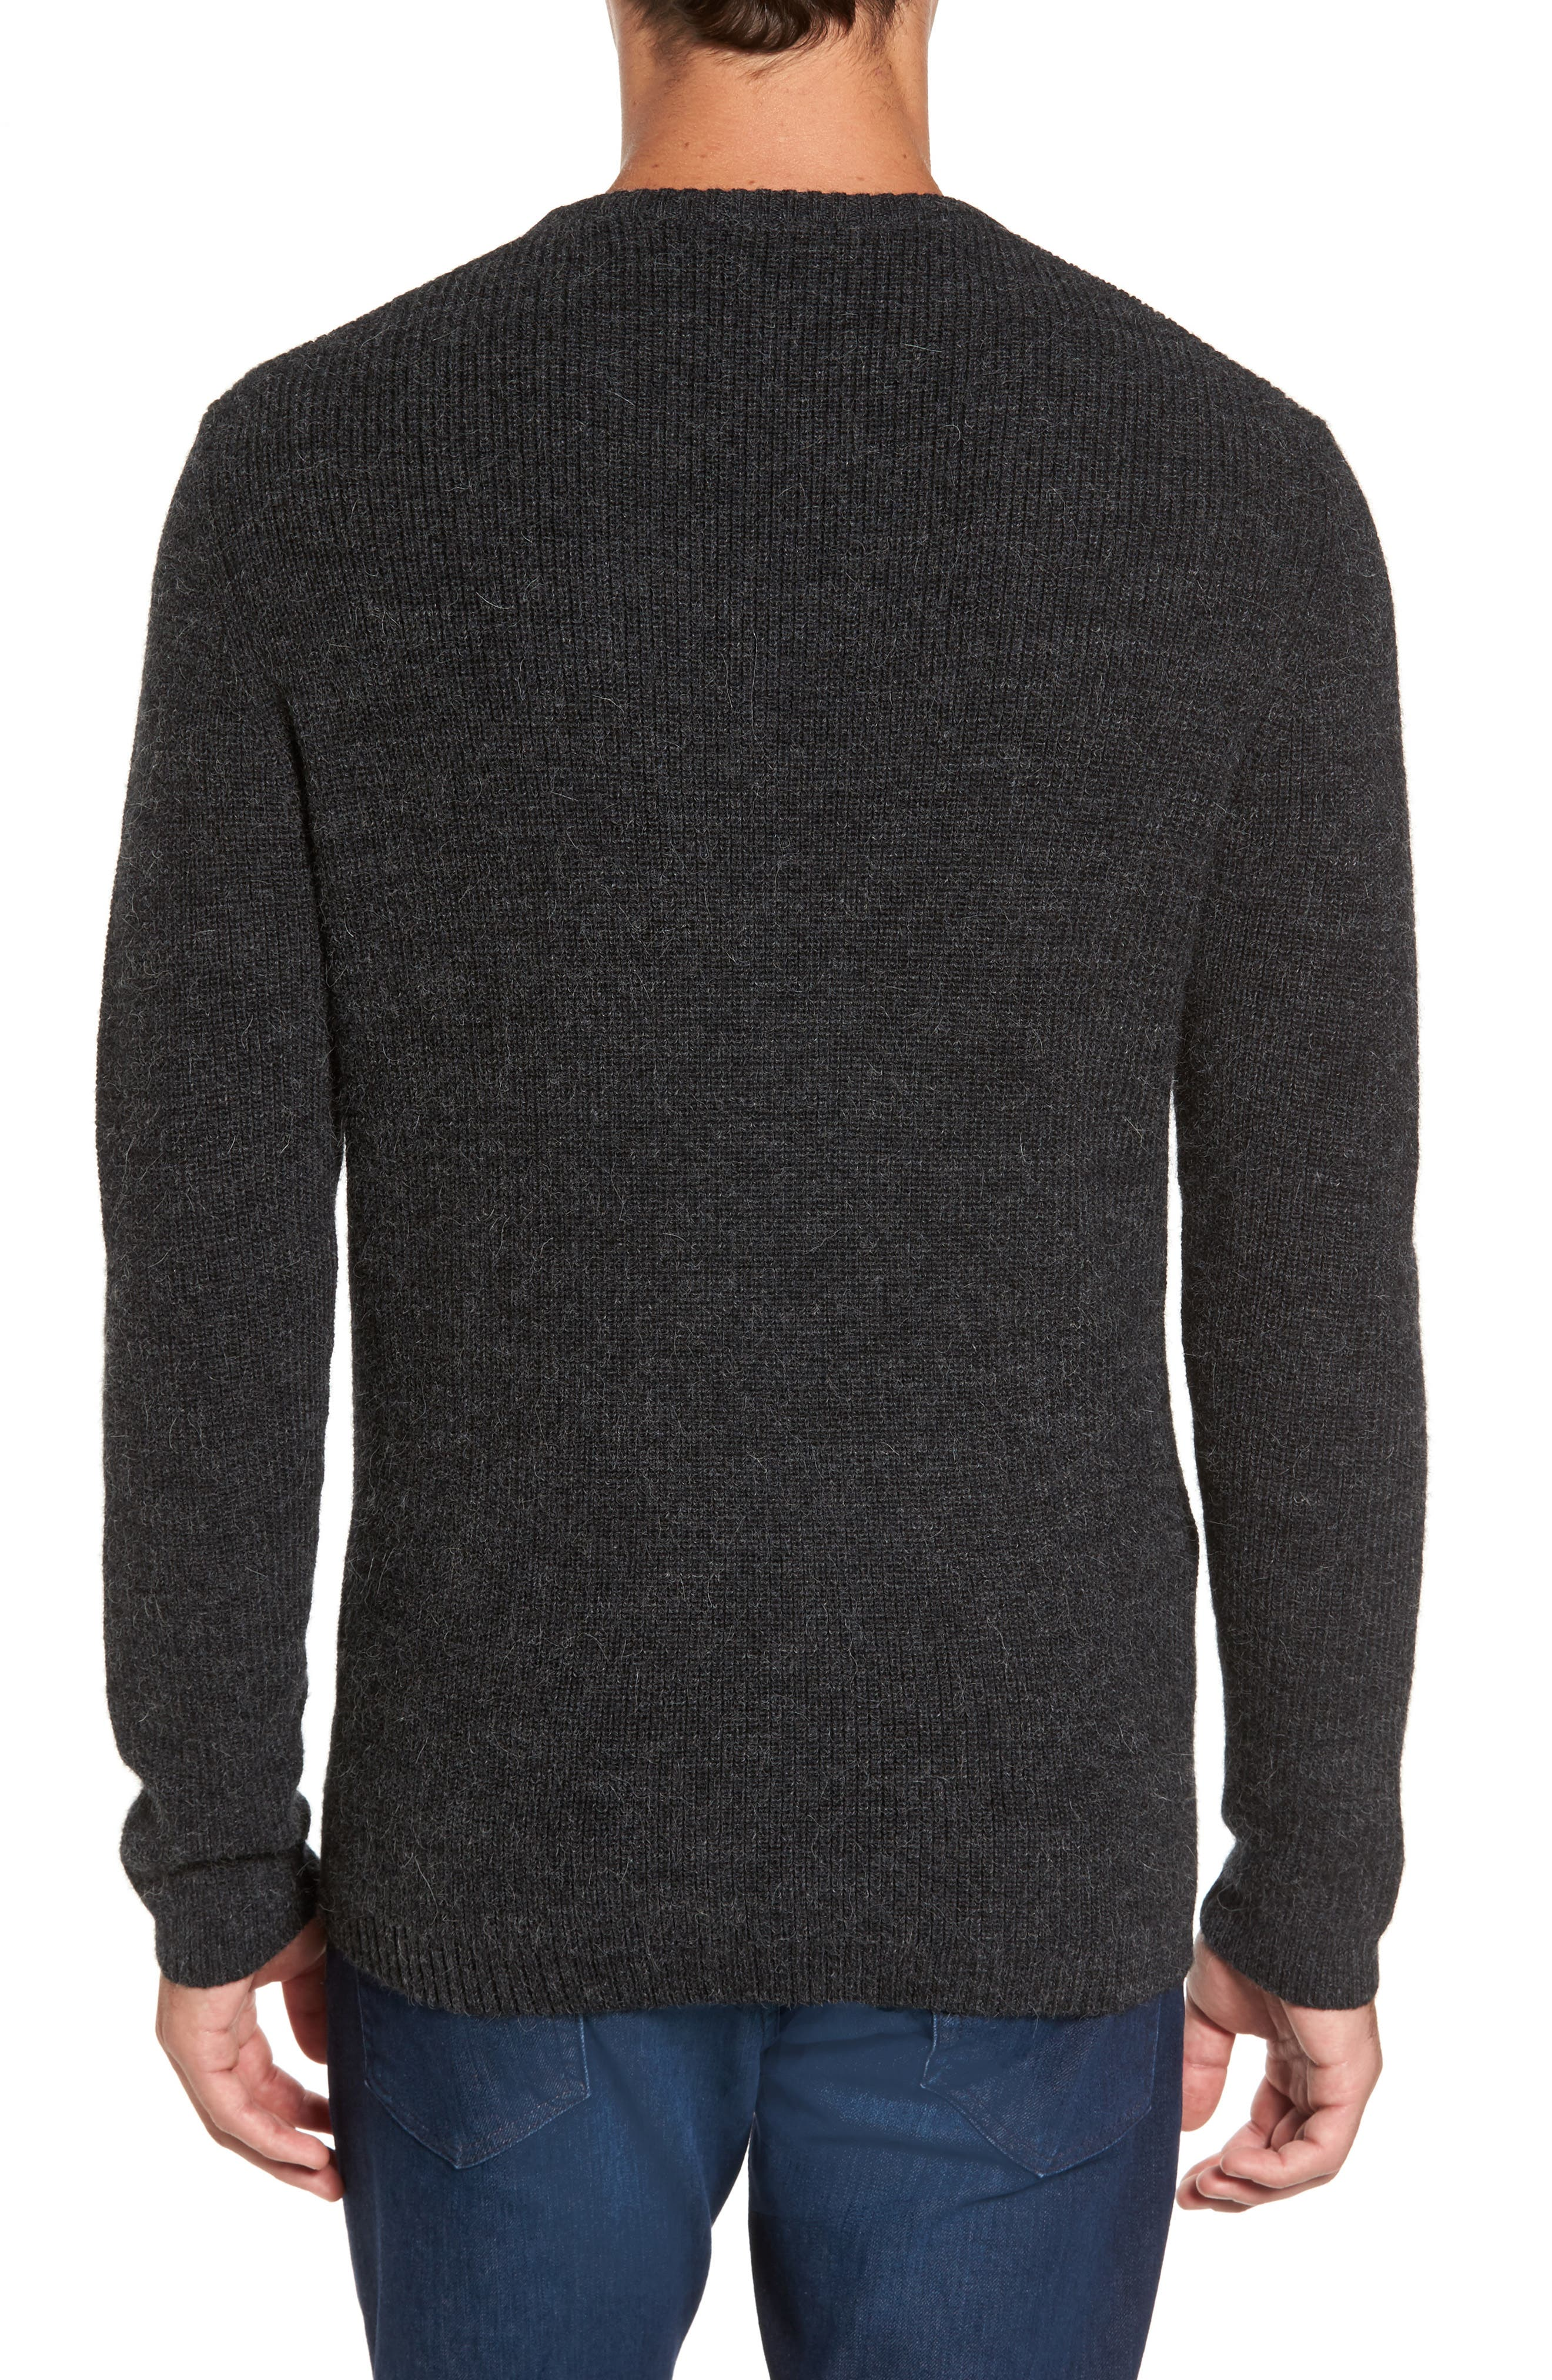 Whalers Bay Merino Wool Blend Sweater,                             Alternate thumbnail 2, color,                             001